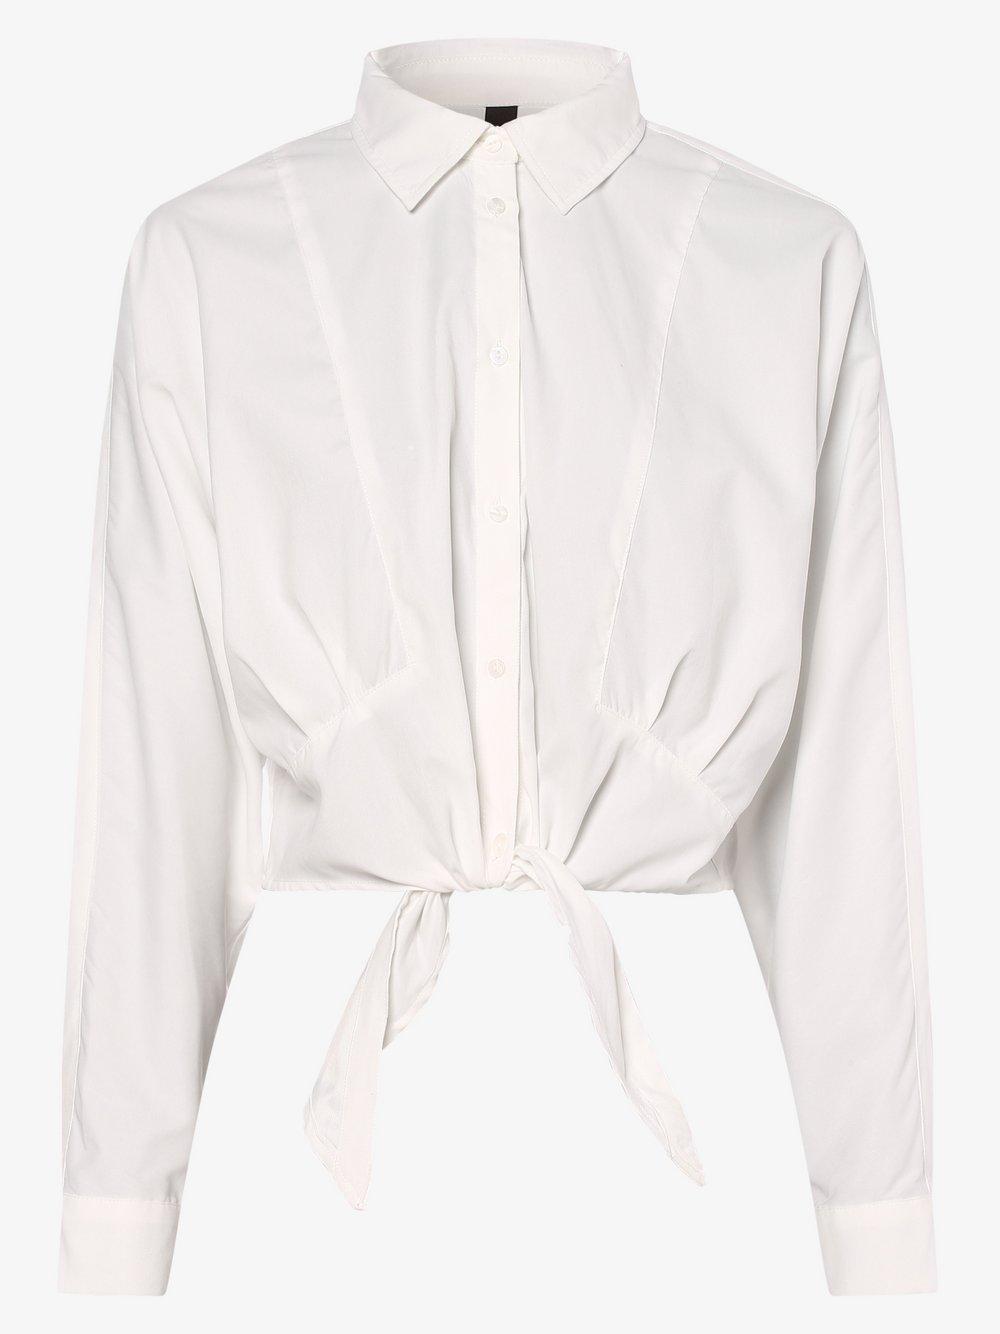 Y.A.S – Bluzka damska – Yasnava, biały Van Graaf 469197-0001